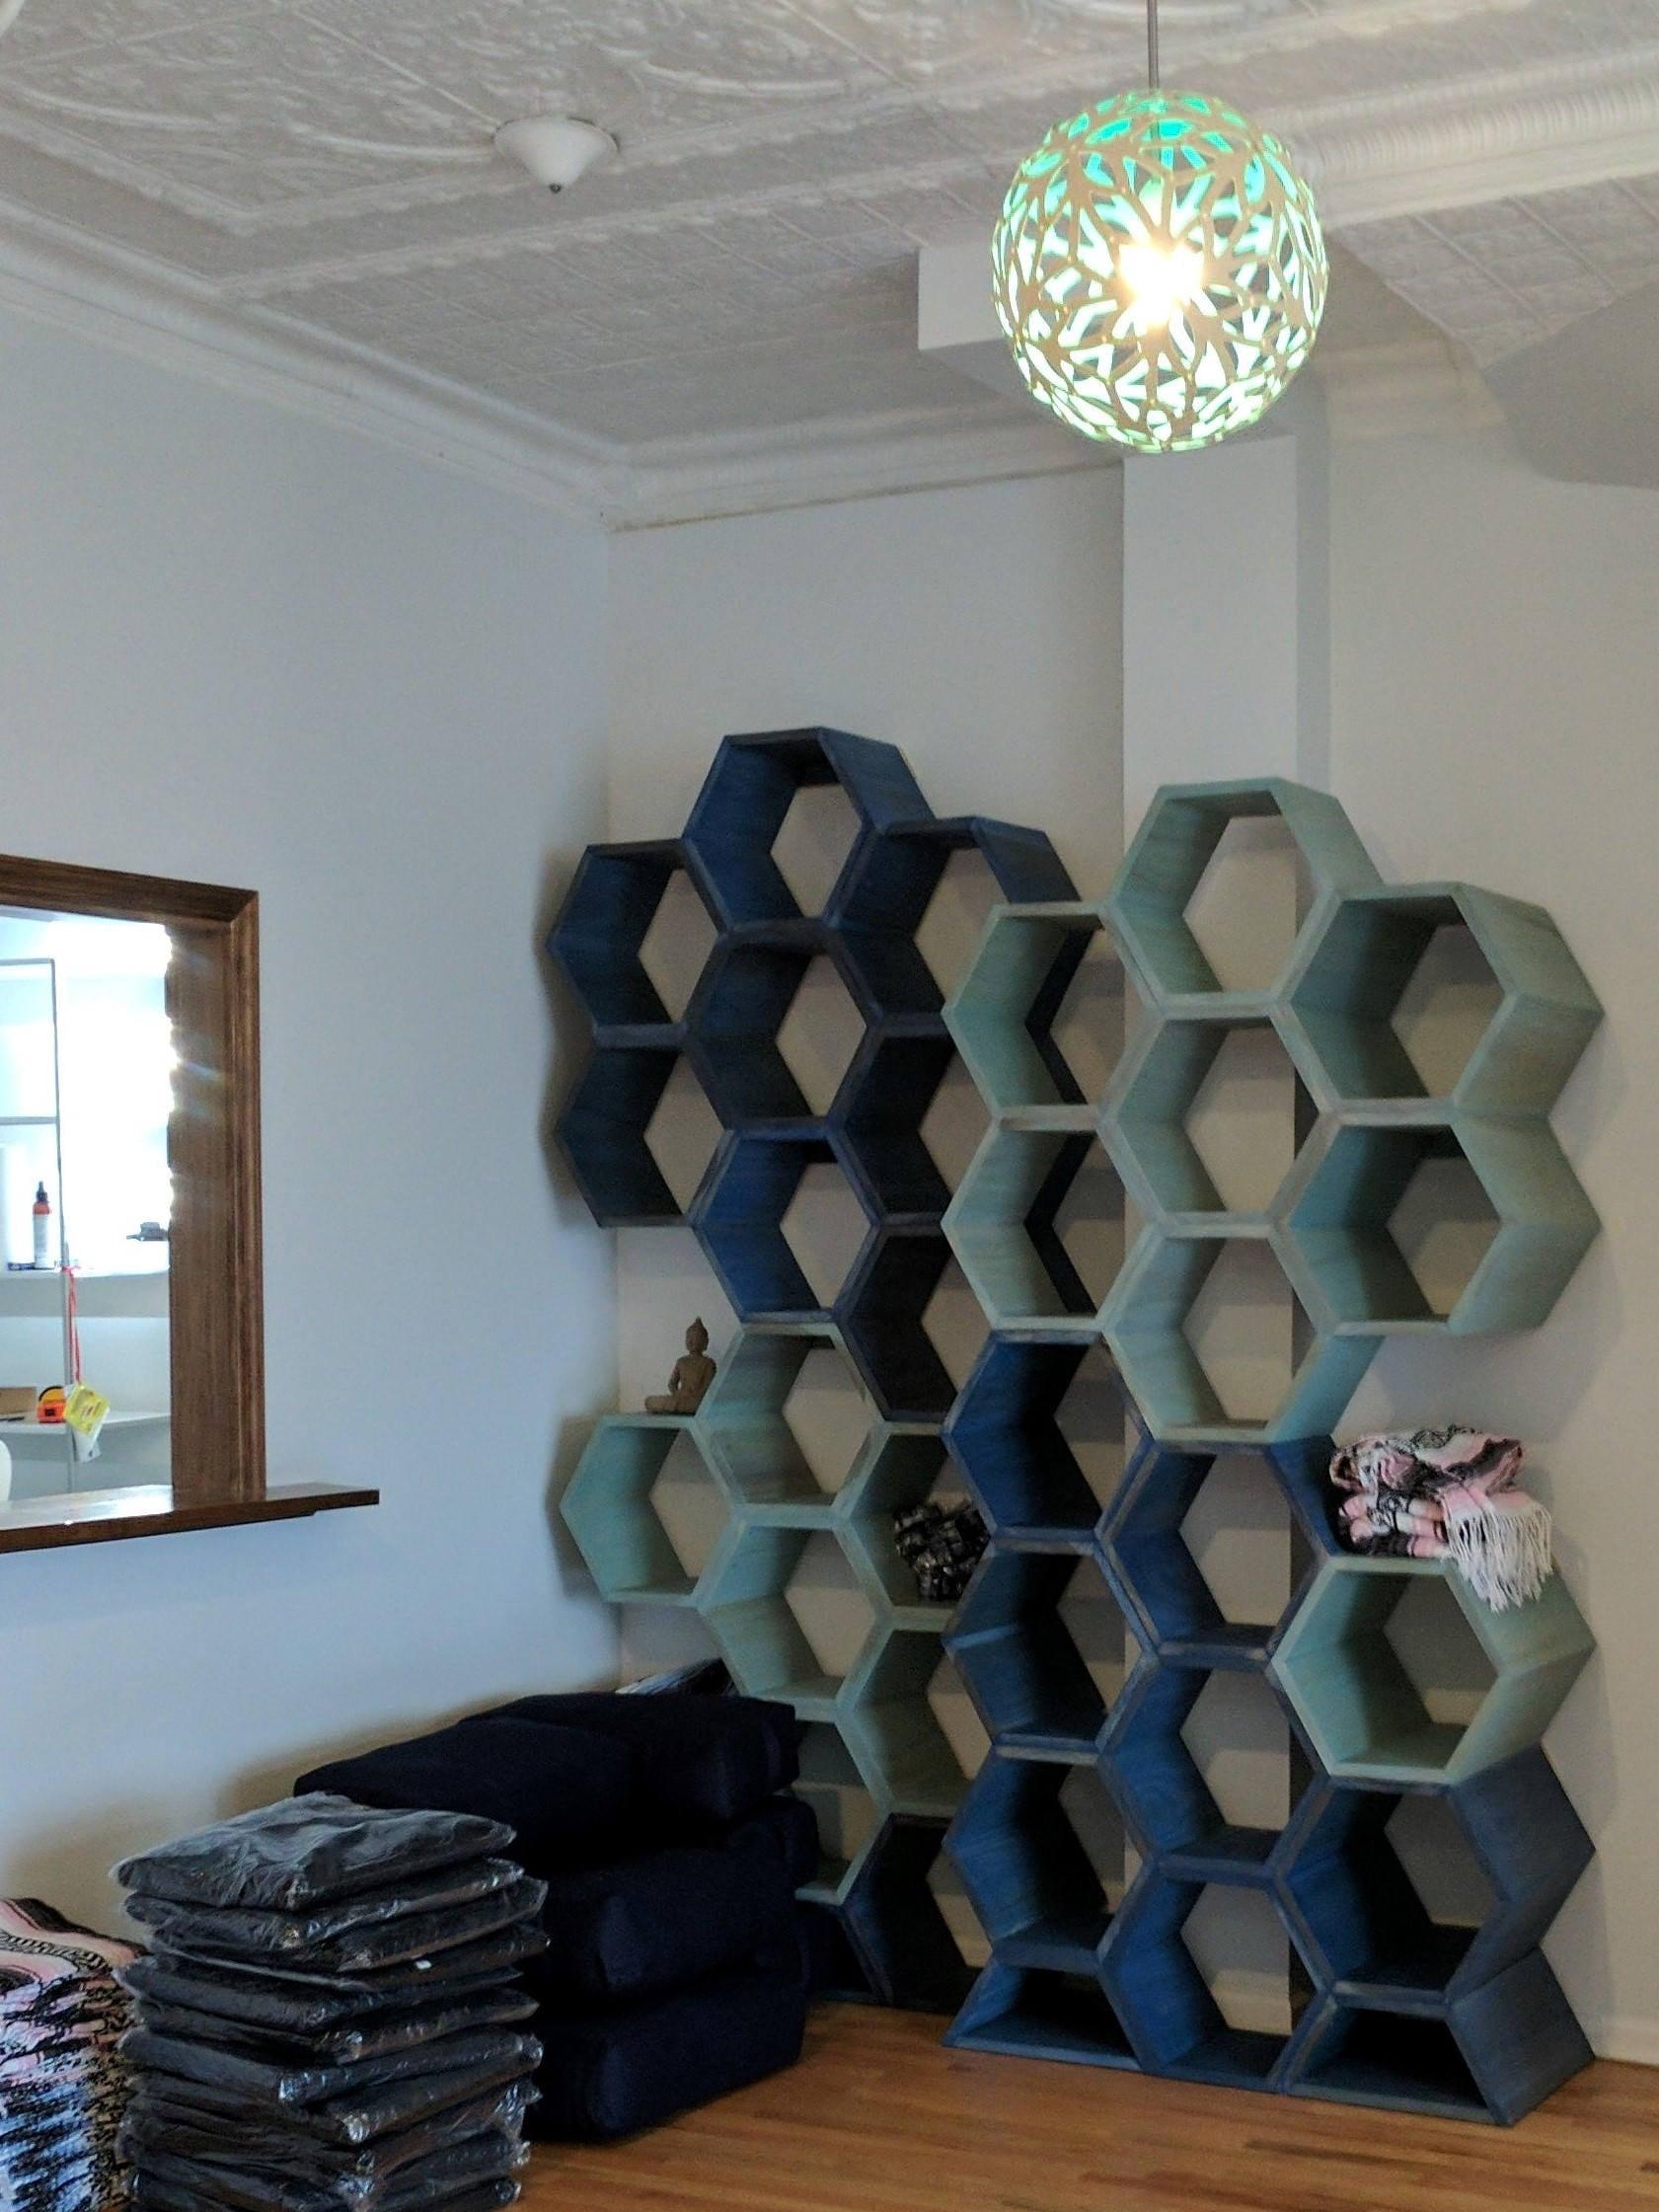 Hexagon Shelves Honeycomb Shelves Retail Display Wall Art